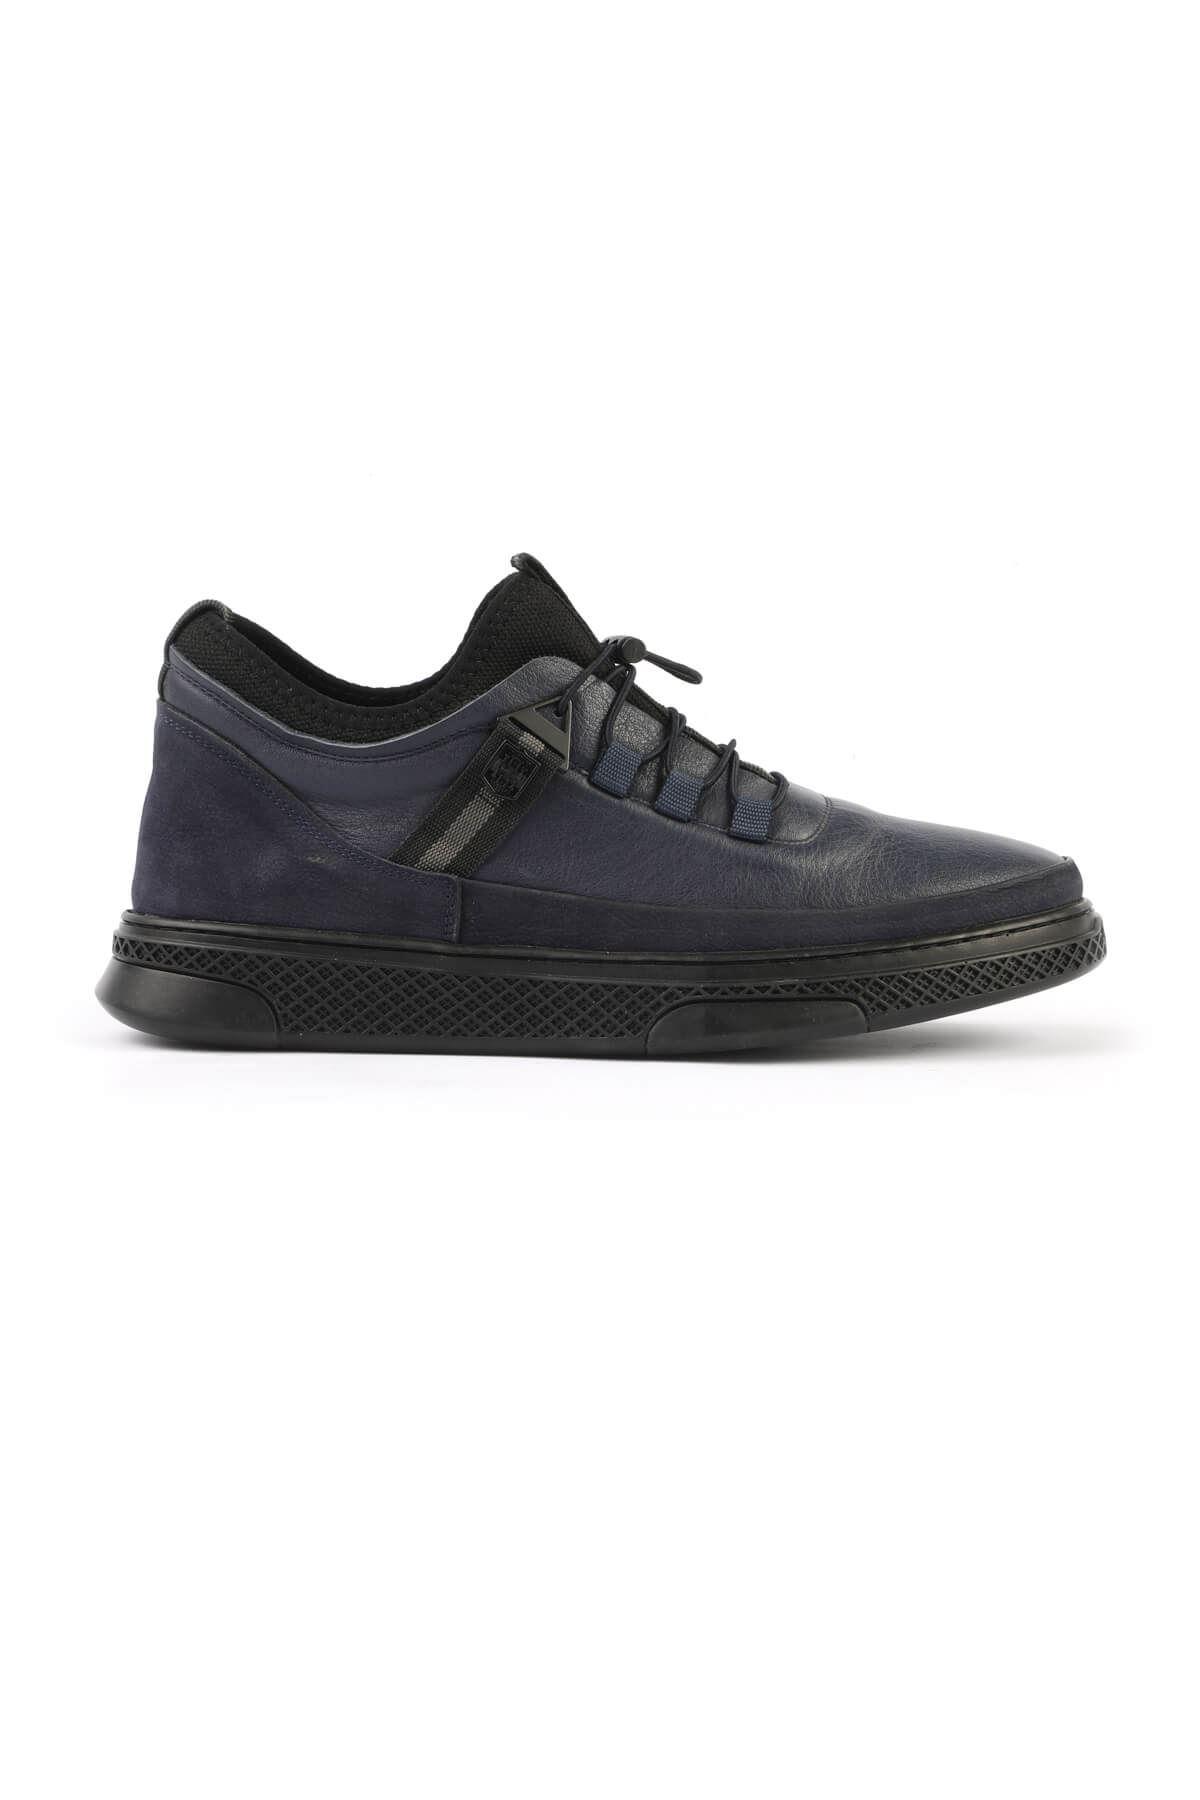 Libero 1325 Navy Blue Men's Boots